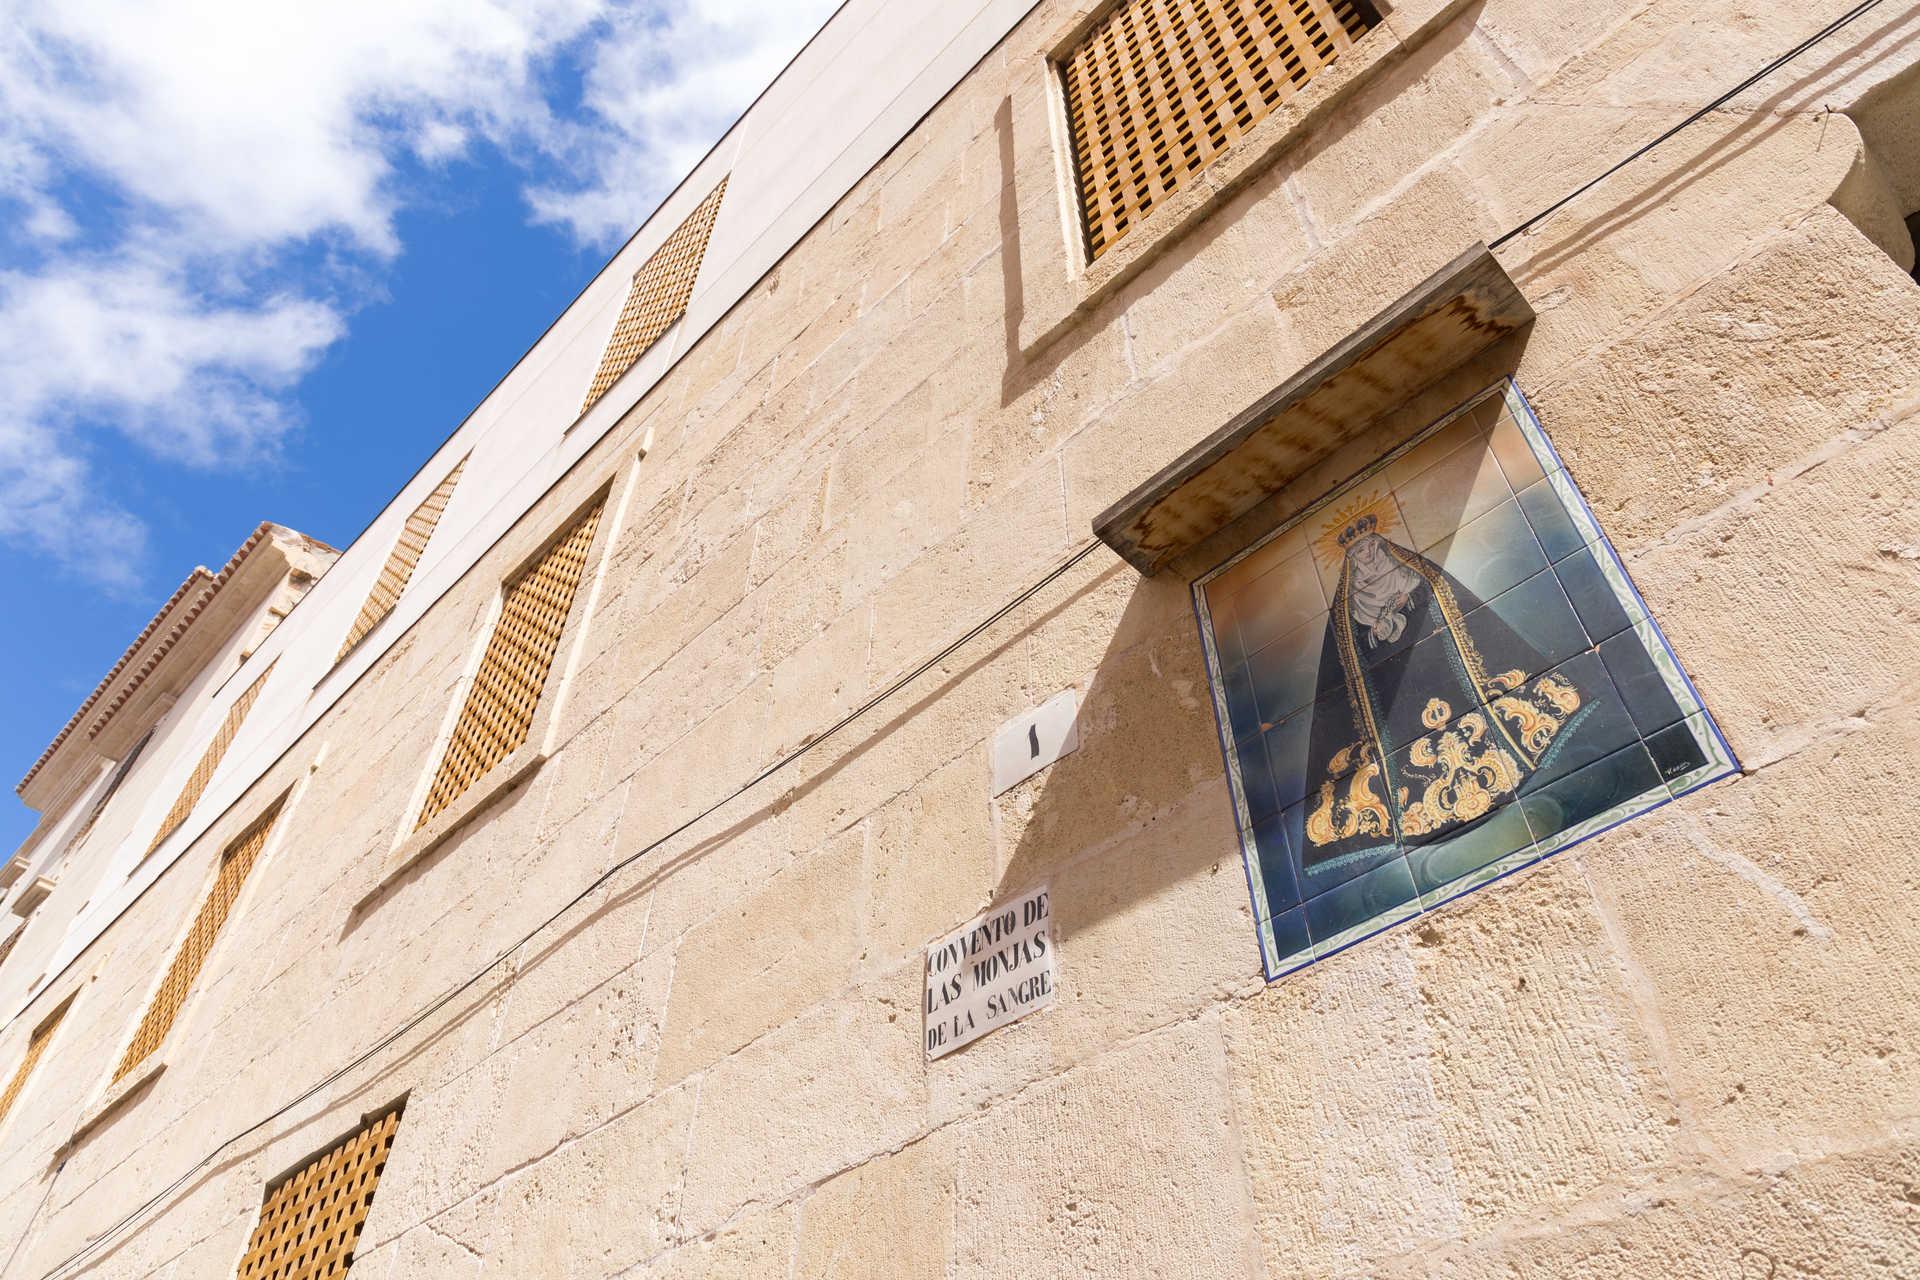 Monastère De La Preciosísima Sangre De Cristo (Charmantissime Sang Du Christ)